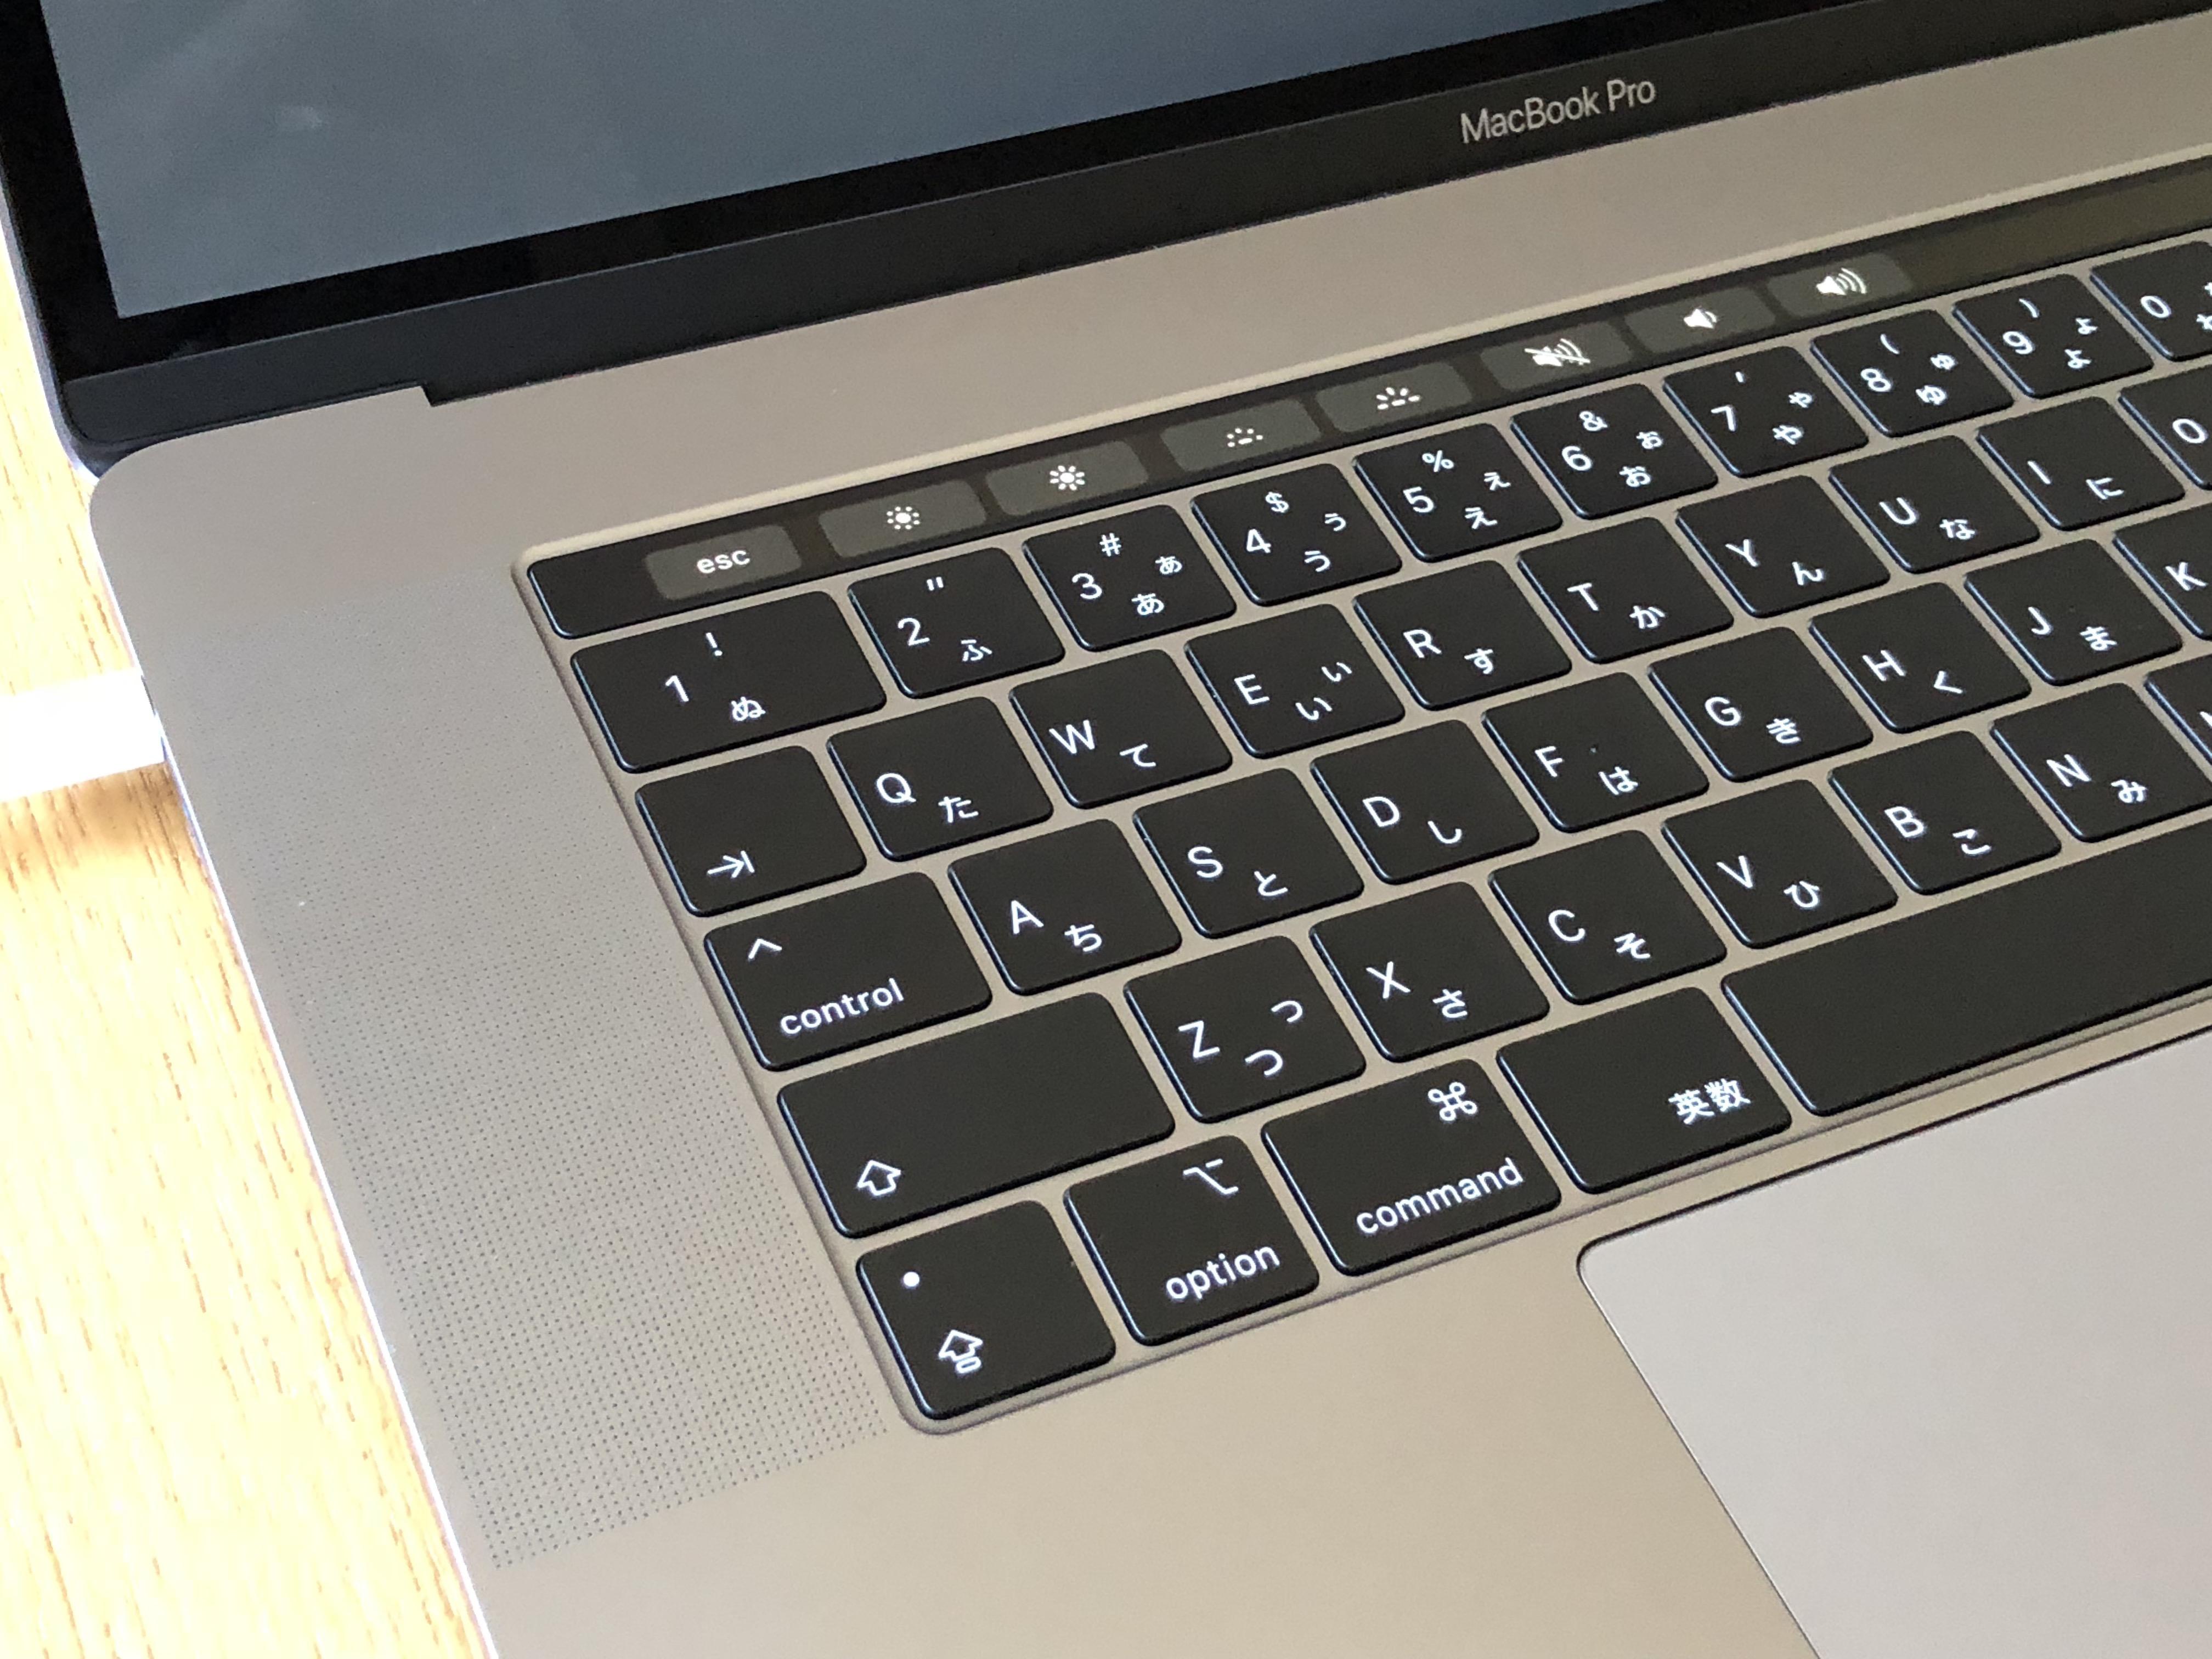 MacBook Pro (15-inch, 2018)、2.9 GHz Intel Core i9、32 GB 2400 MHz DDR4、Intel UHD Graphics 630 1536 MB